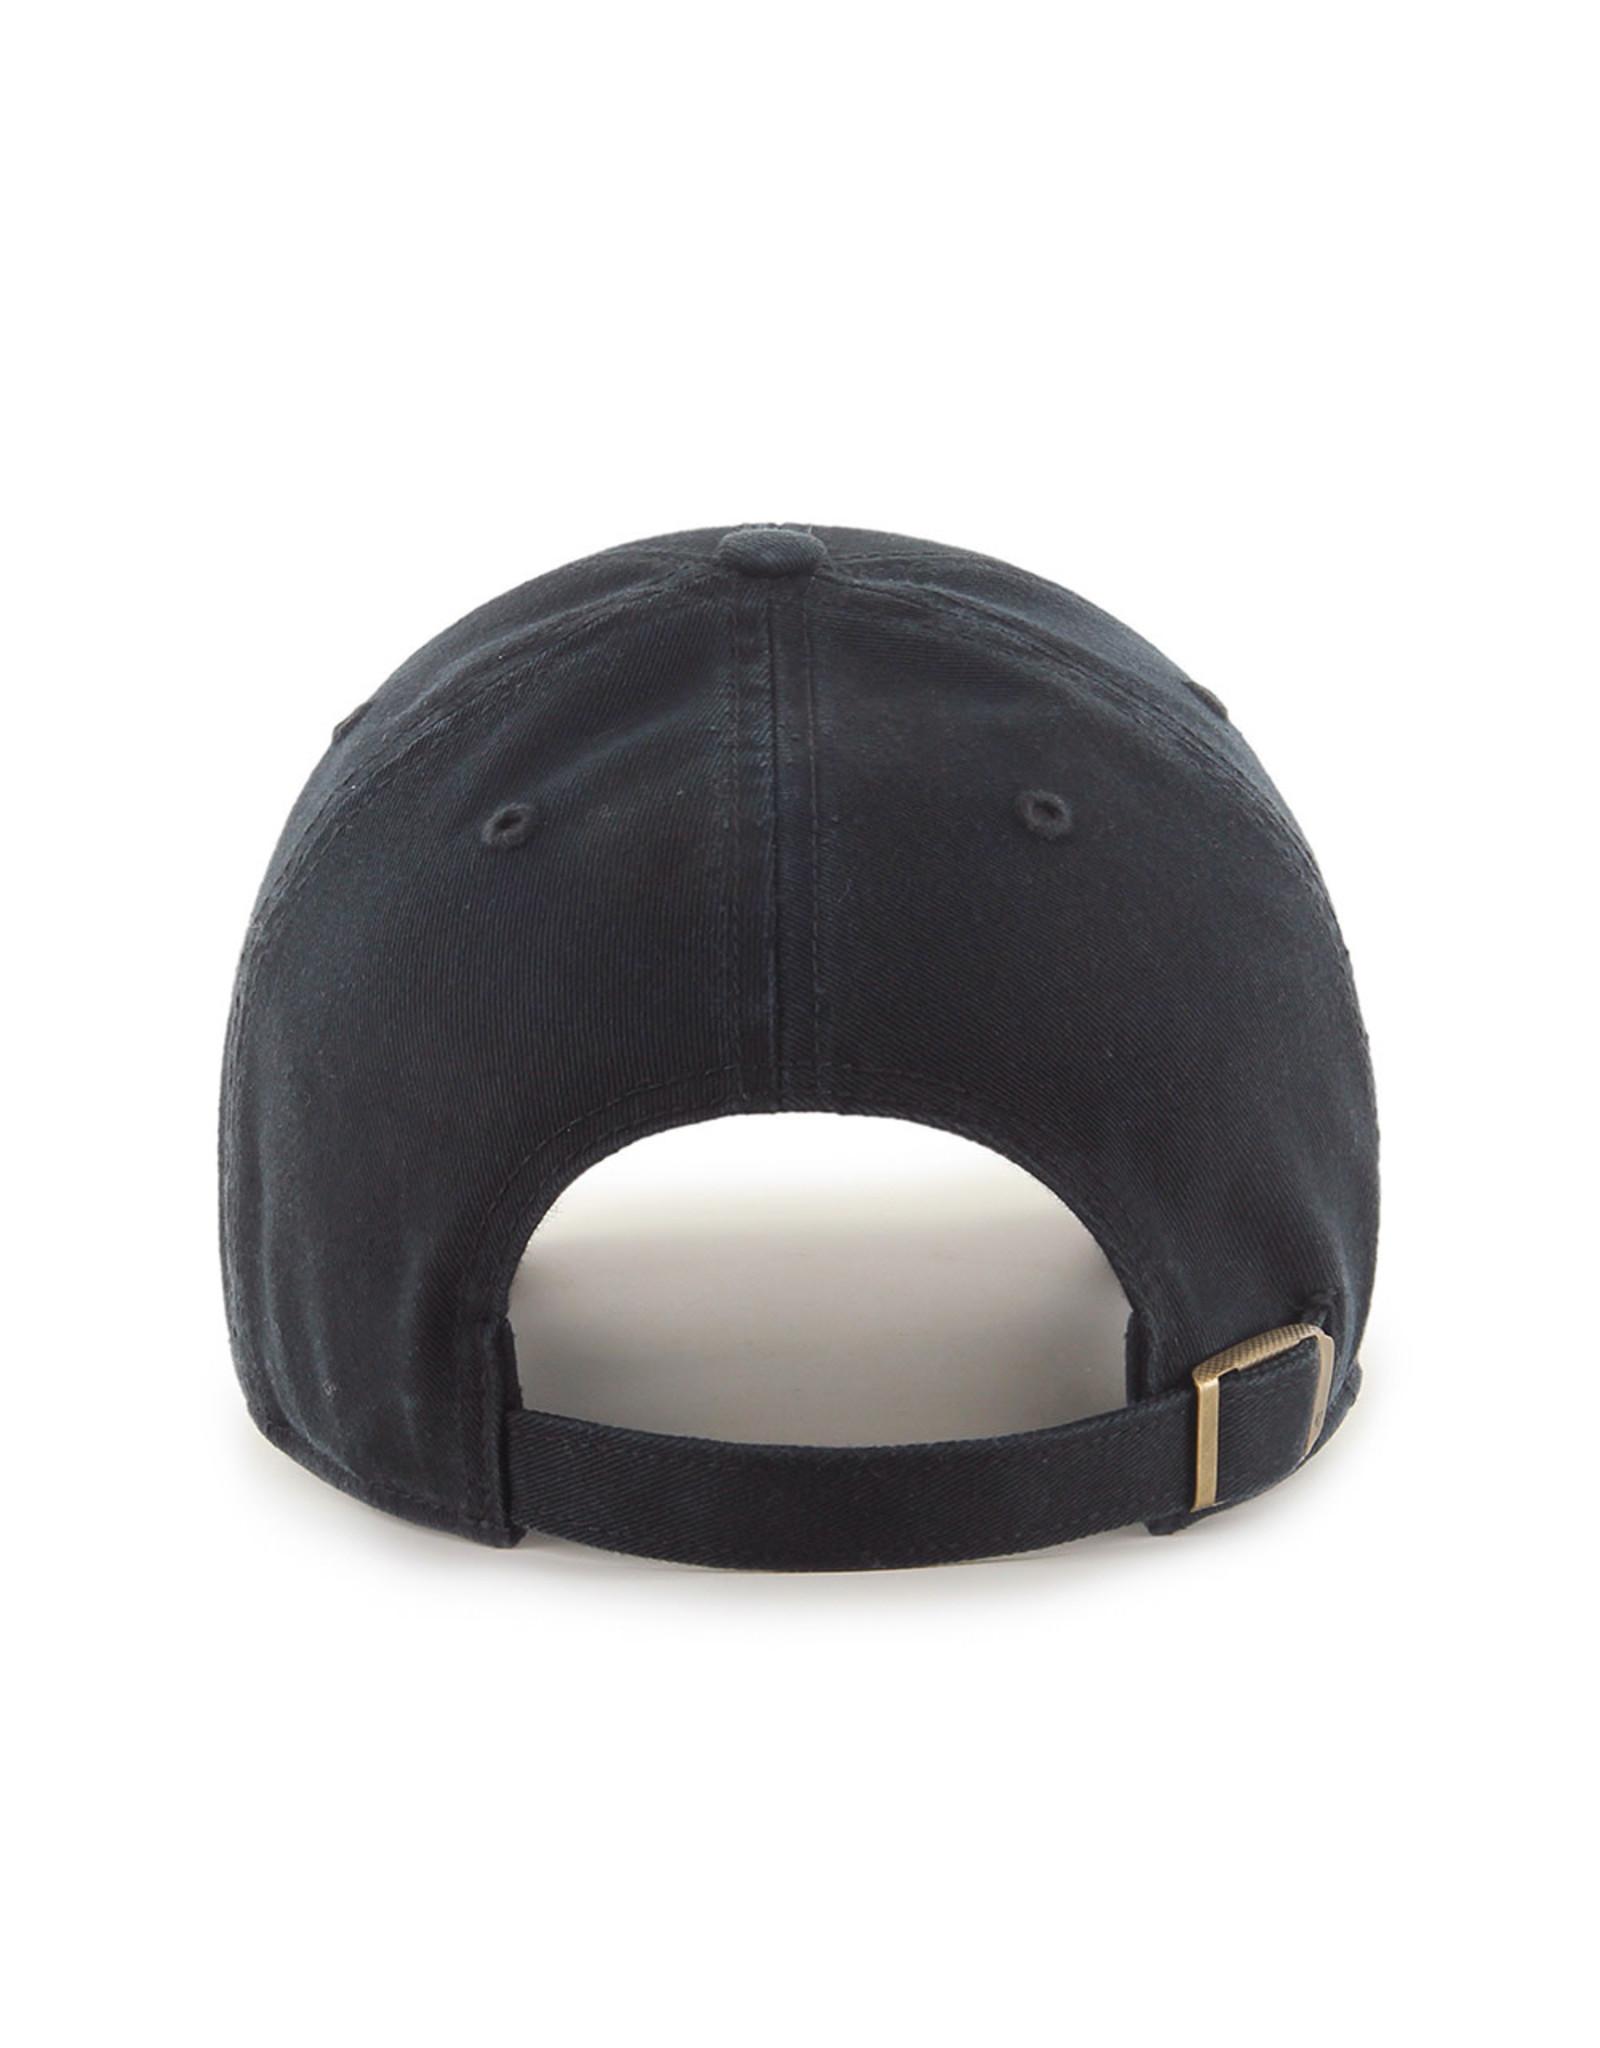 '47 Brand 1217 Legend Black MVP Cap